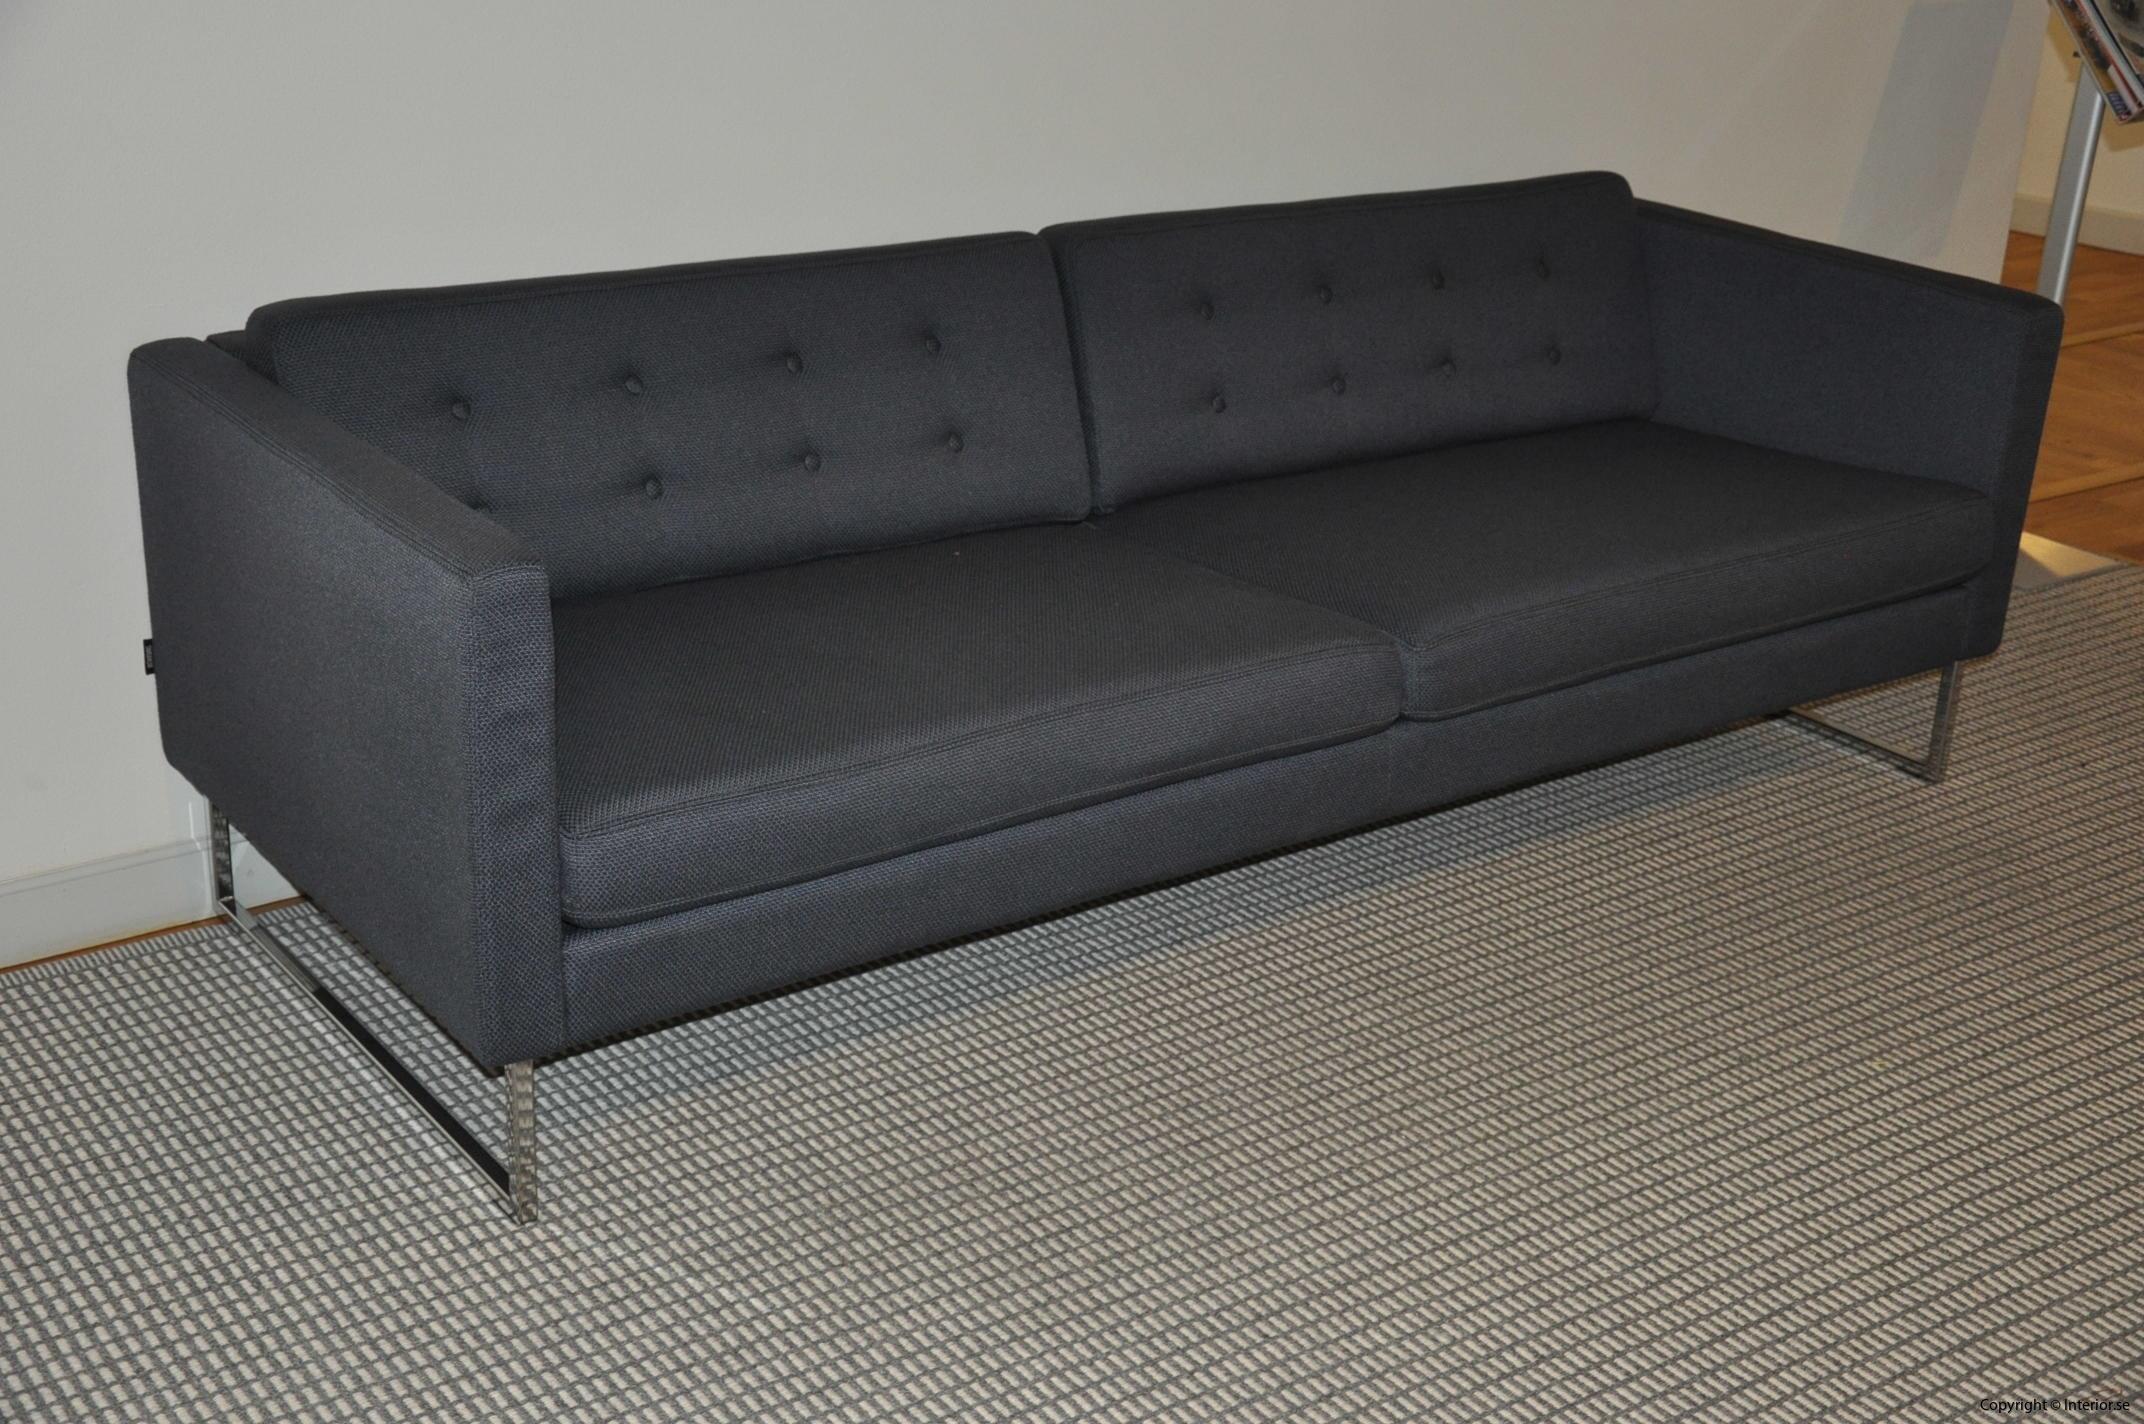 Begagnade designmöbler Swedese Madisson 3 sitssoffa (7)